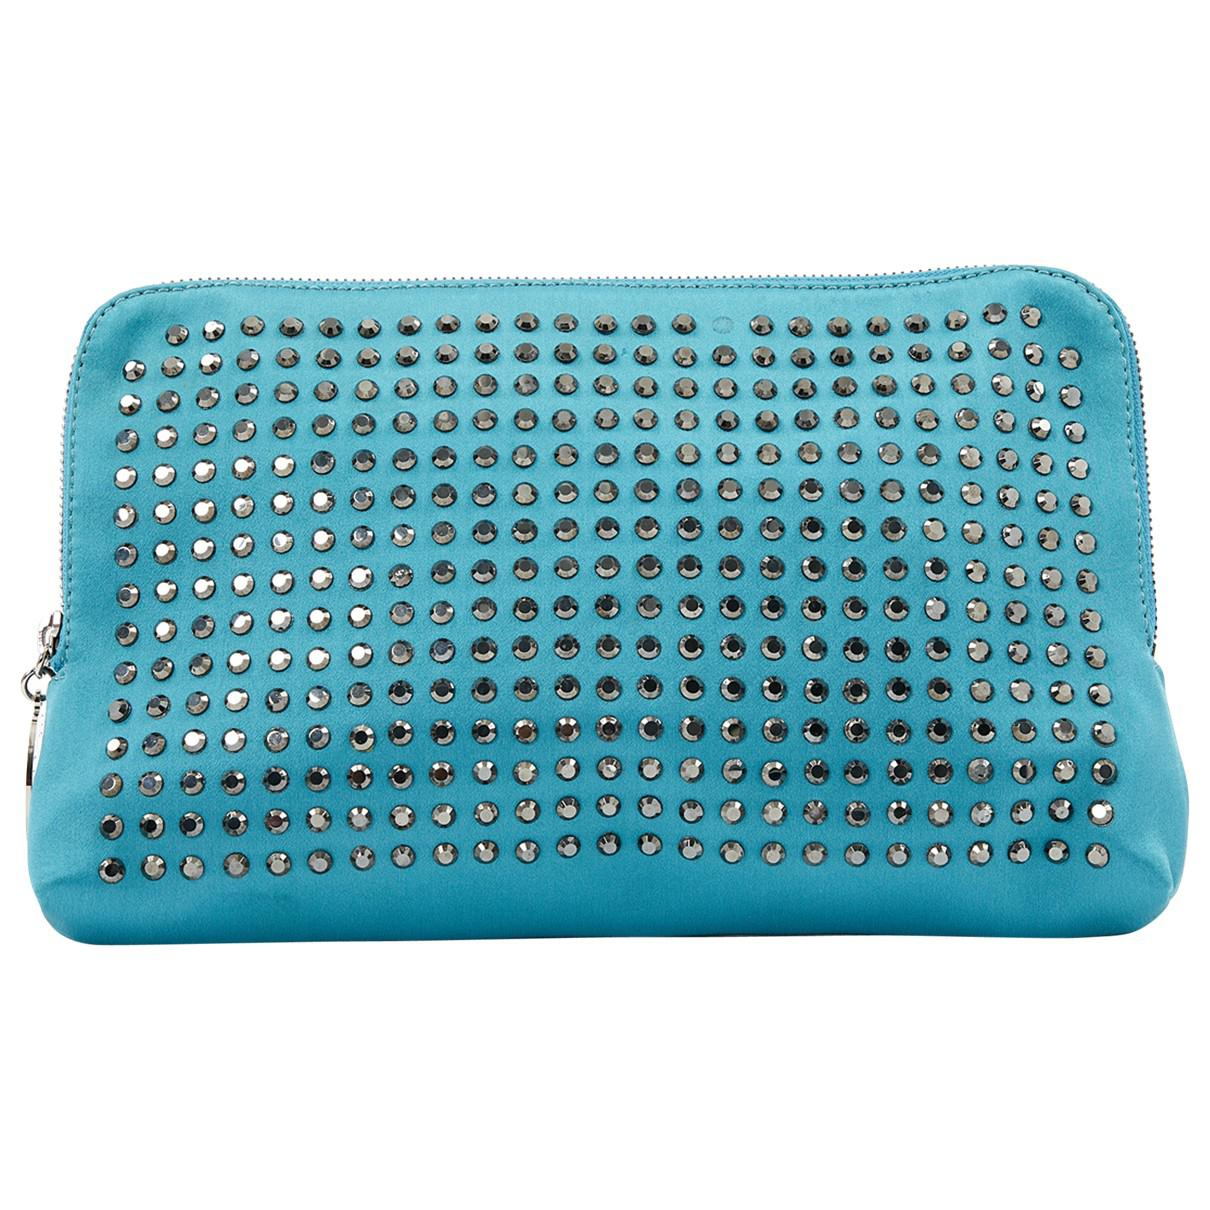 Stella McCartney Pre-owned - Cloth bag E9NjGLIW6D